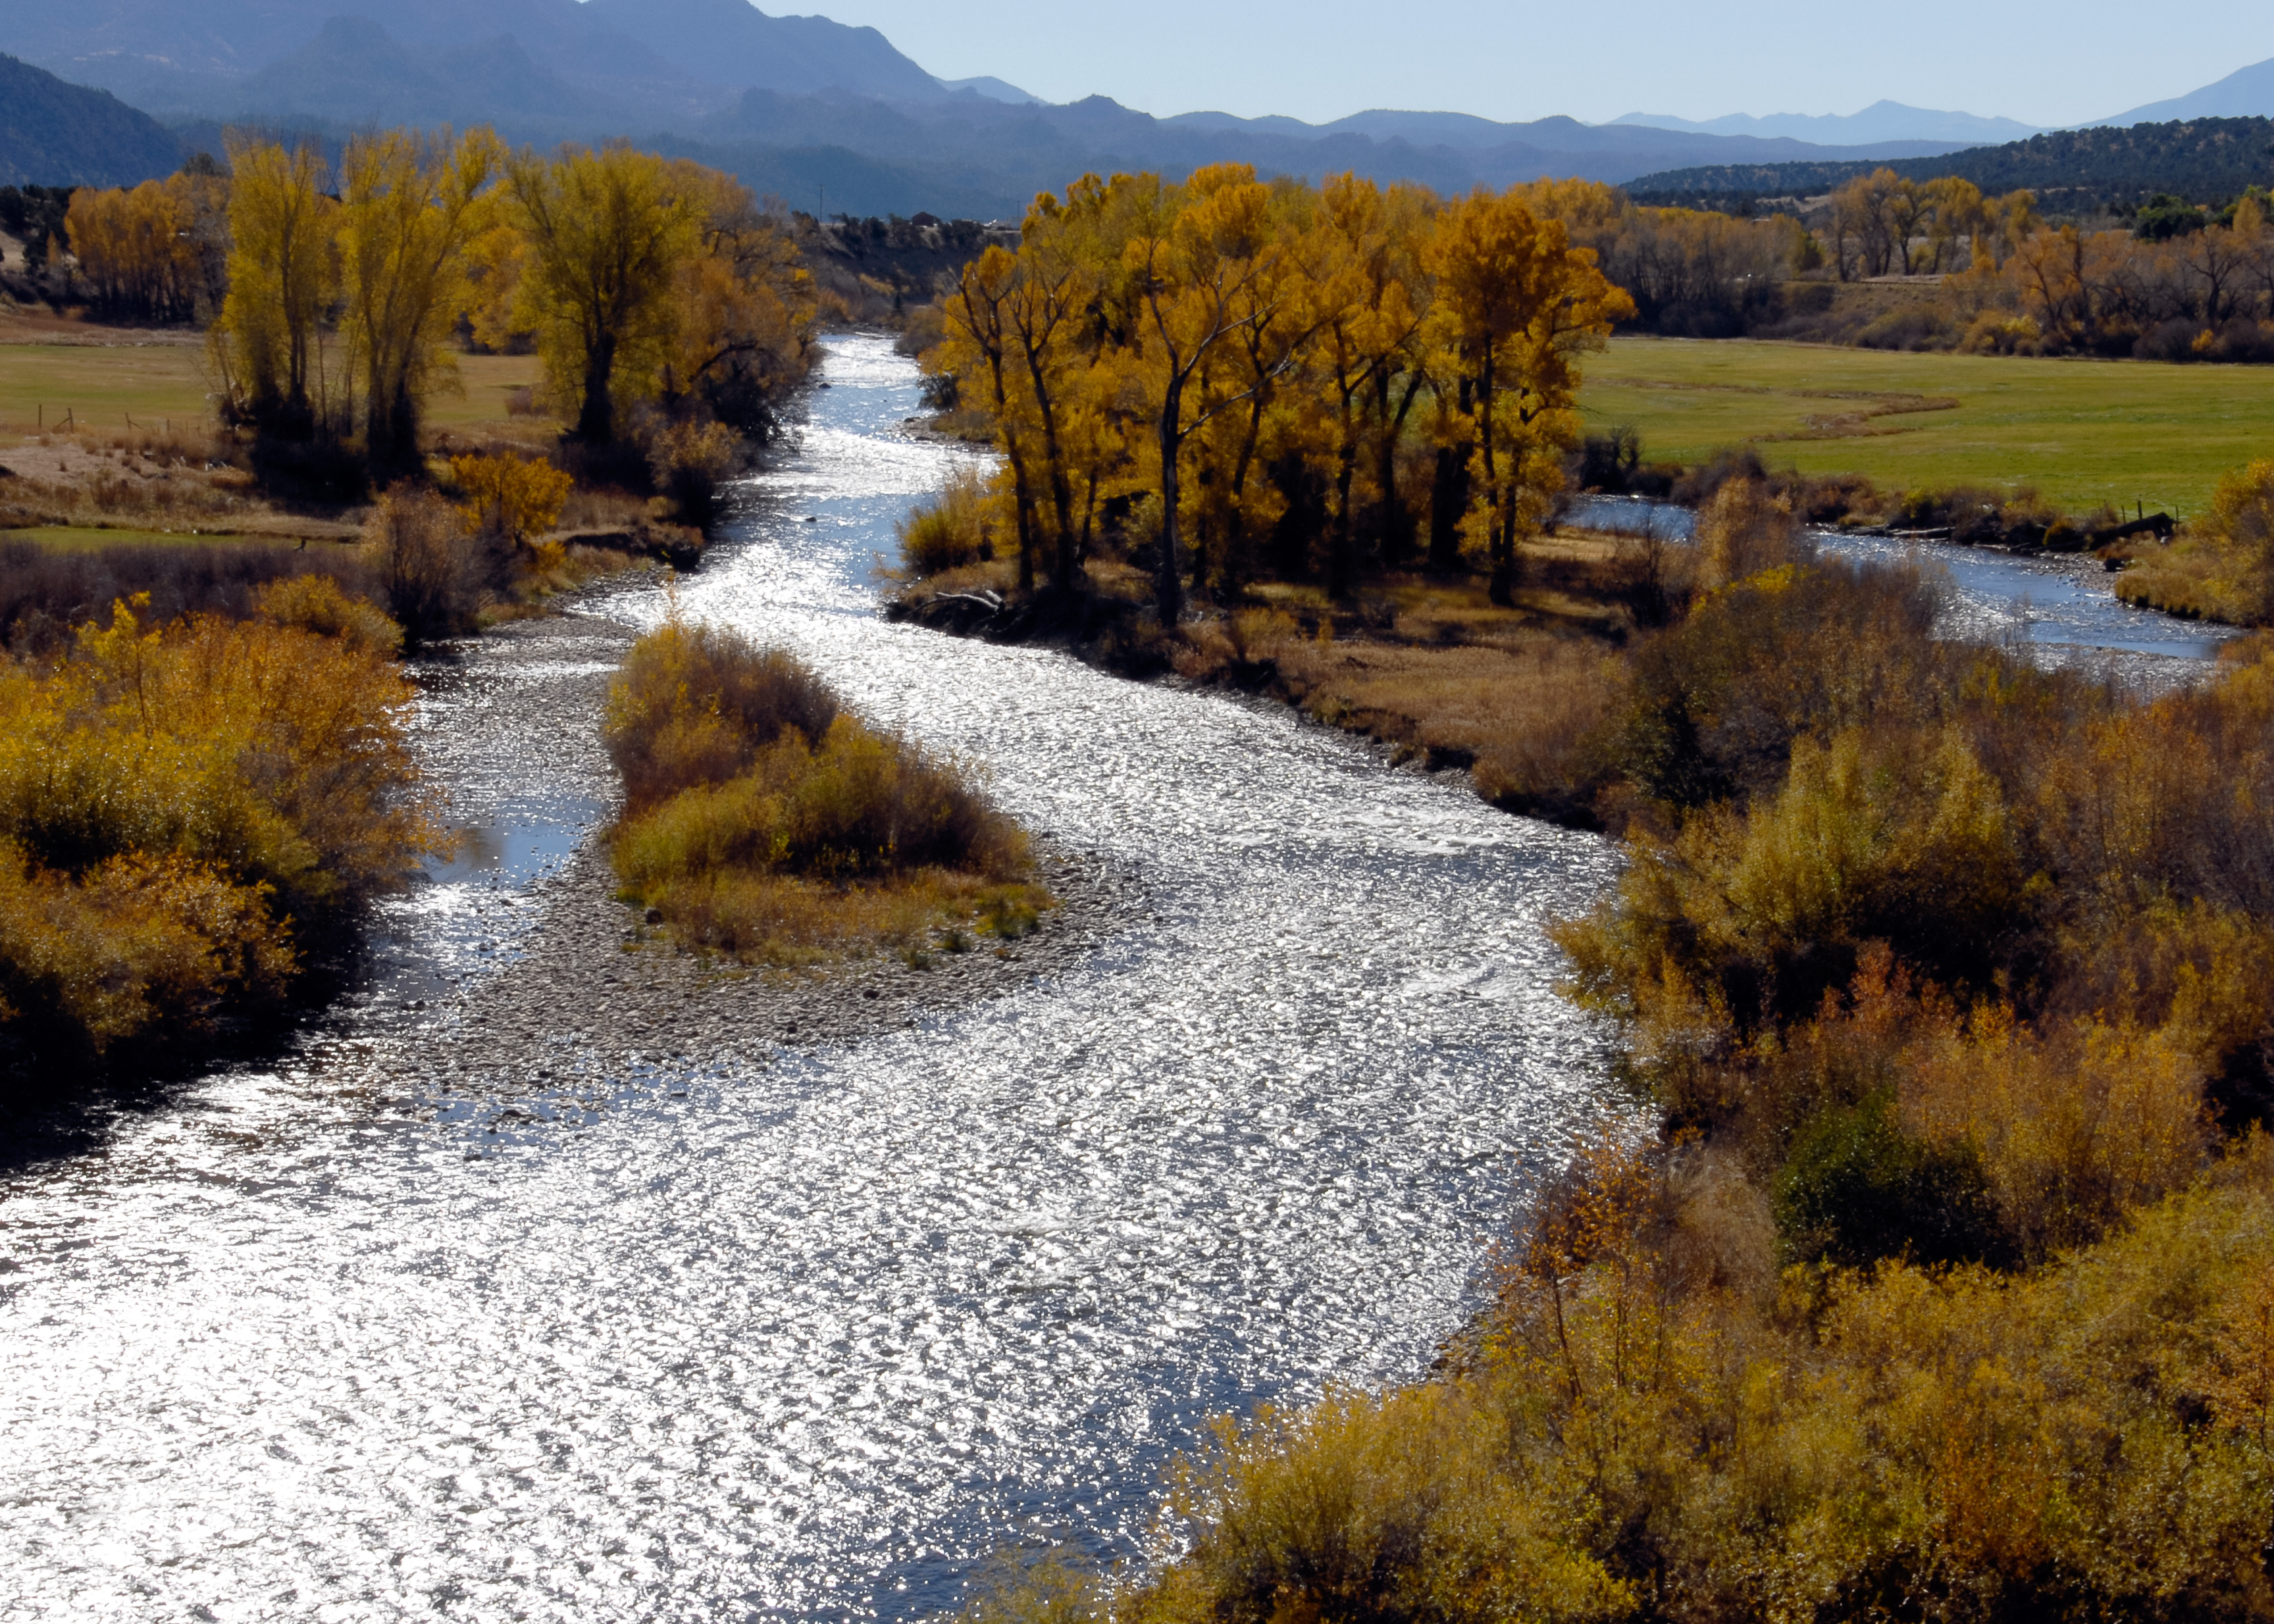 AARP_ColoradoRiver_Hwy24_OutsideLeadville_Lee.jpg